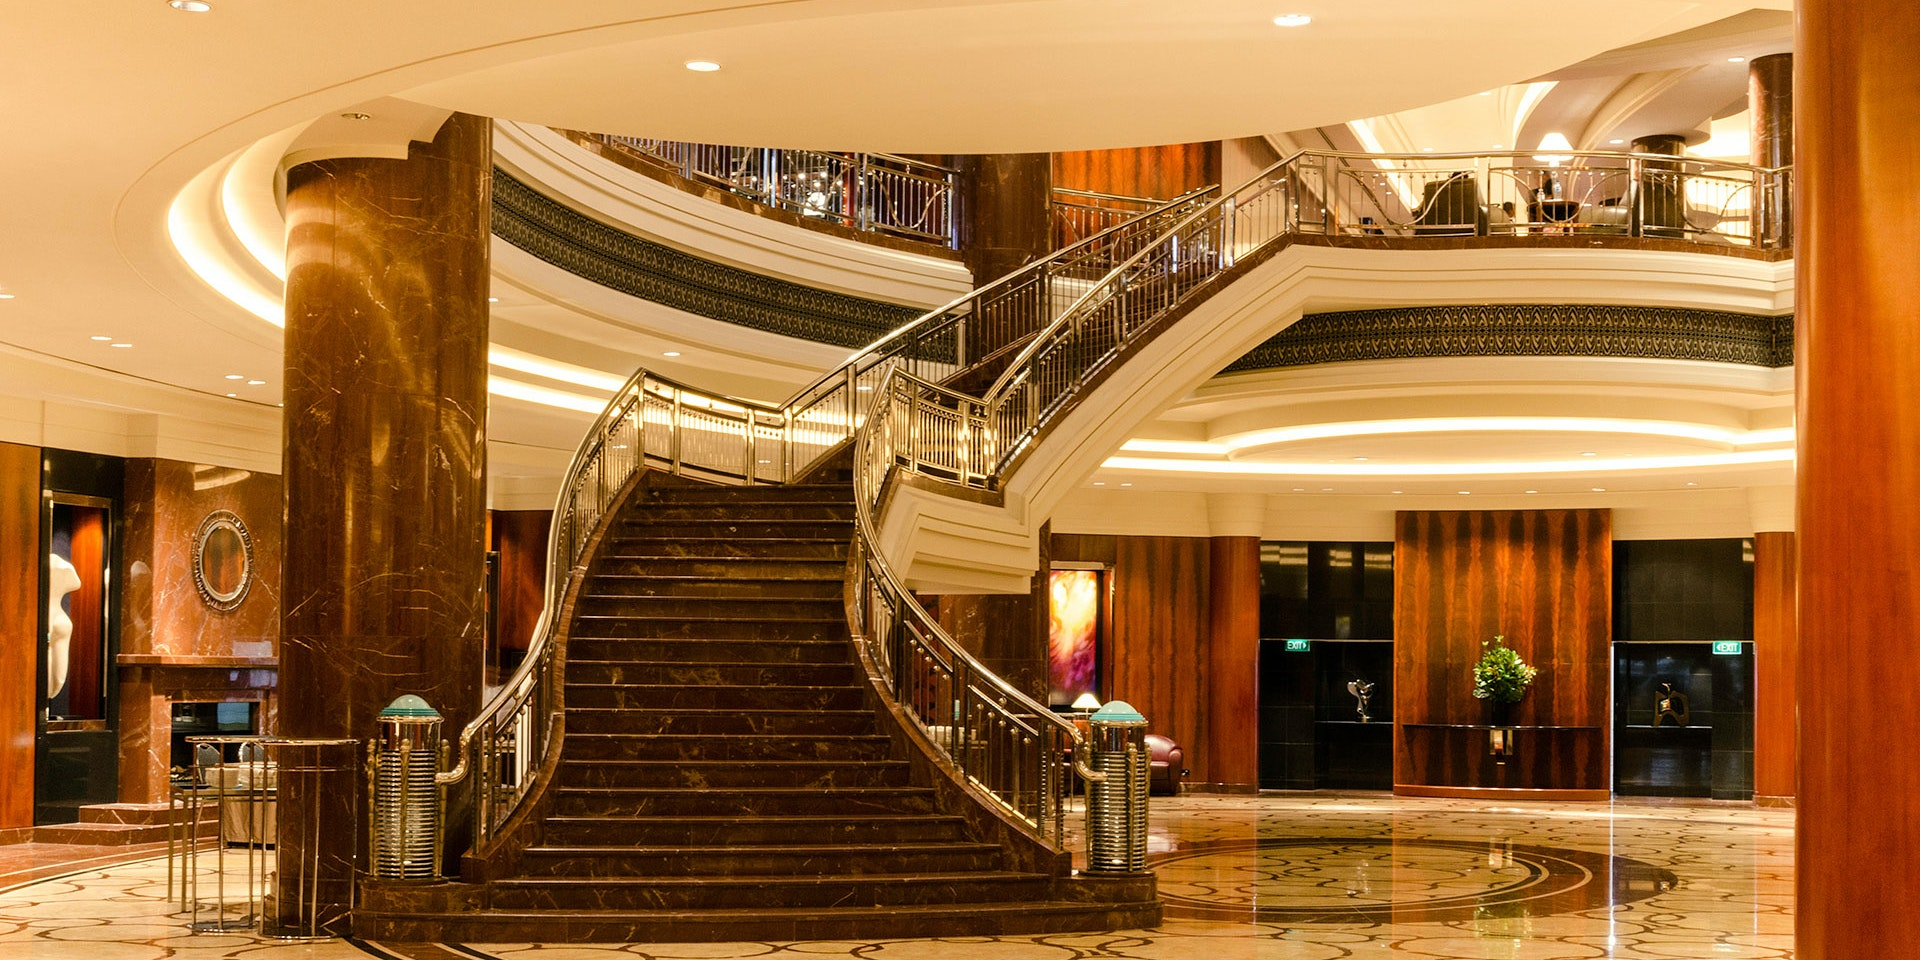 Alto CL Semi-rigid LED strip in application, installed in Park Hyatt hotel in Melbourne.